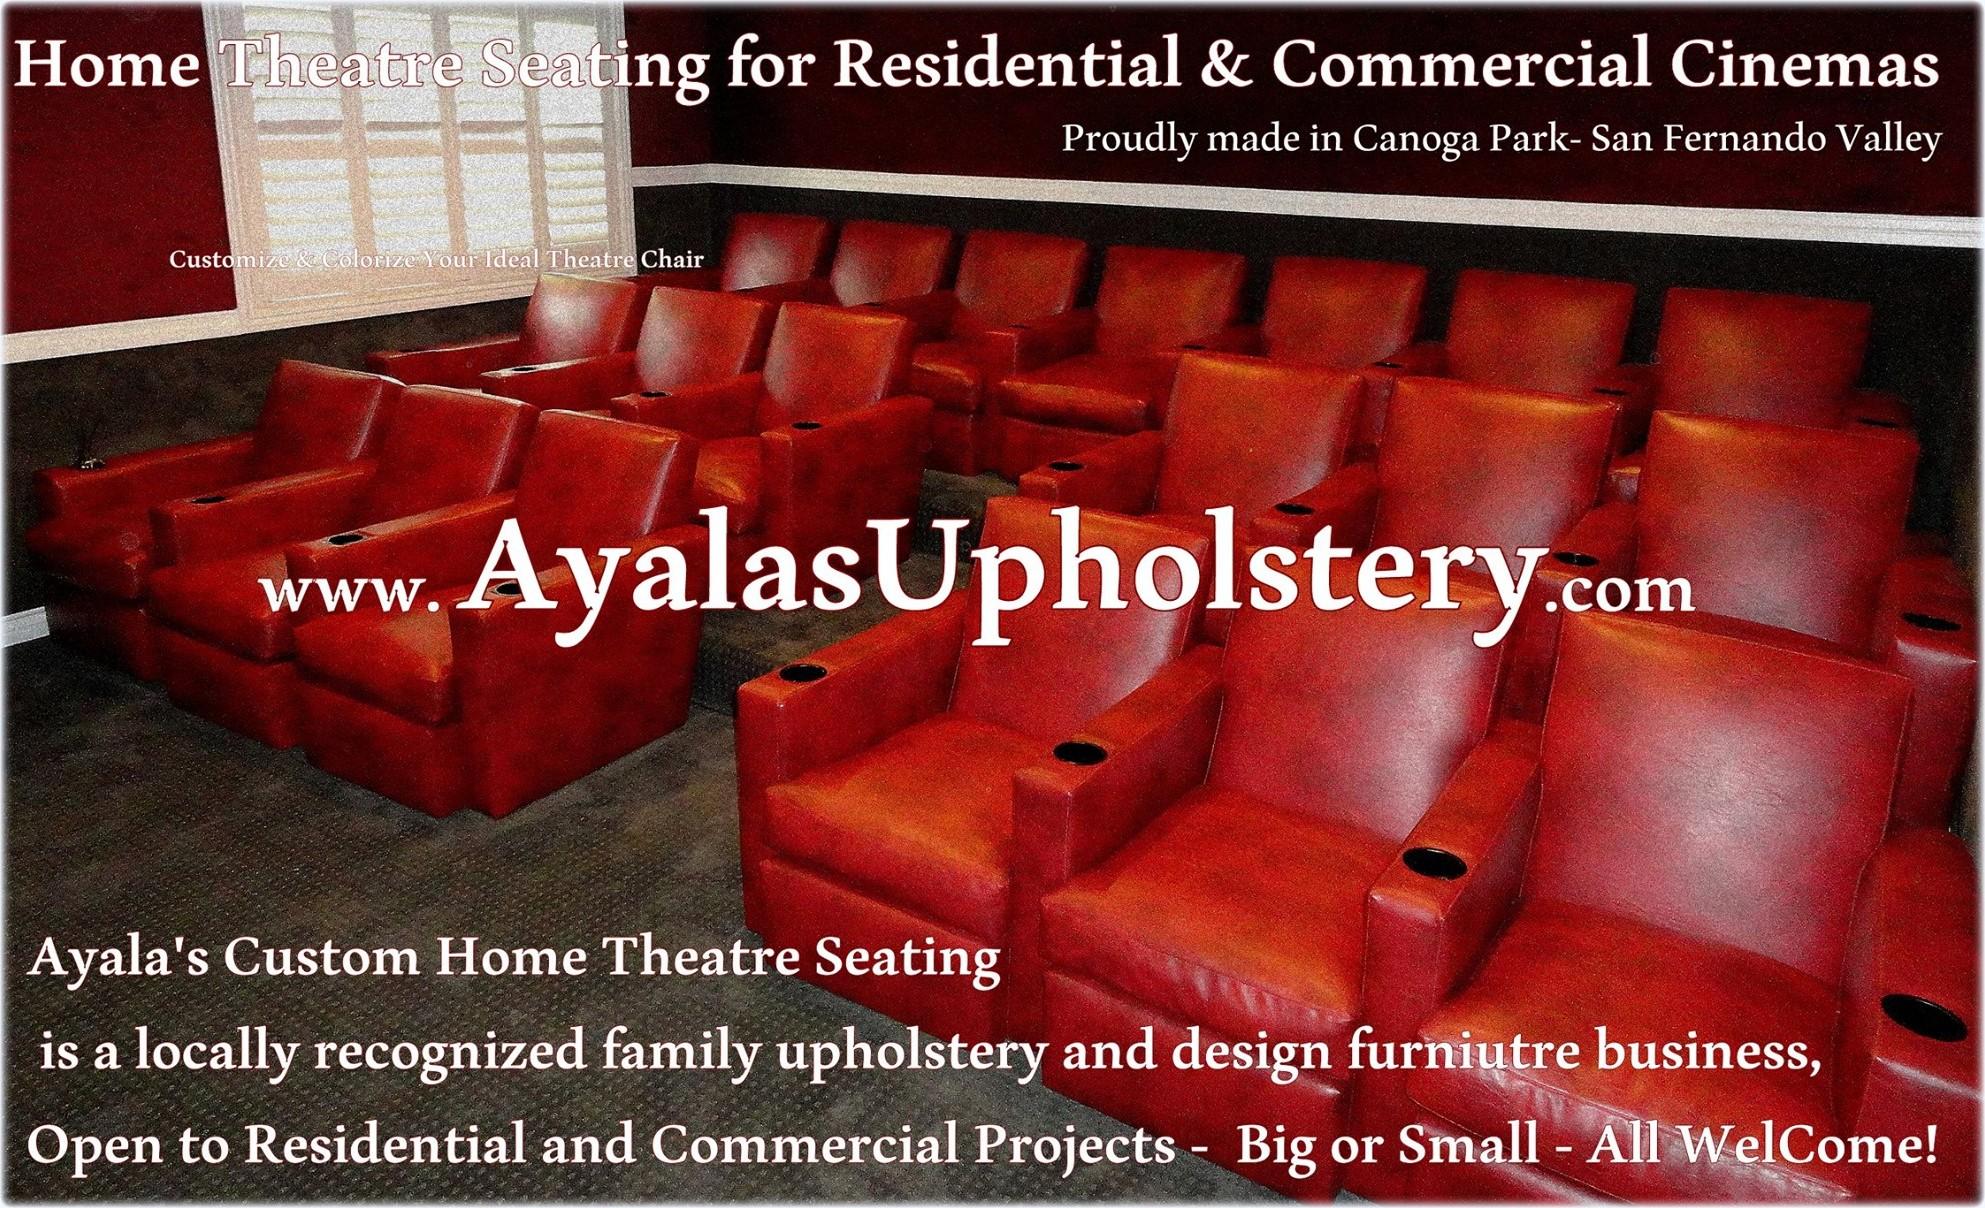 Theater Seats Custom Made by Family Ayala's Upholstery#1.jpg